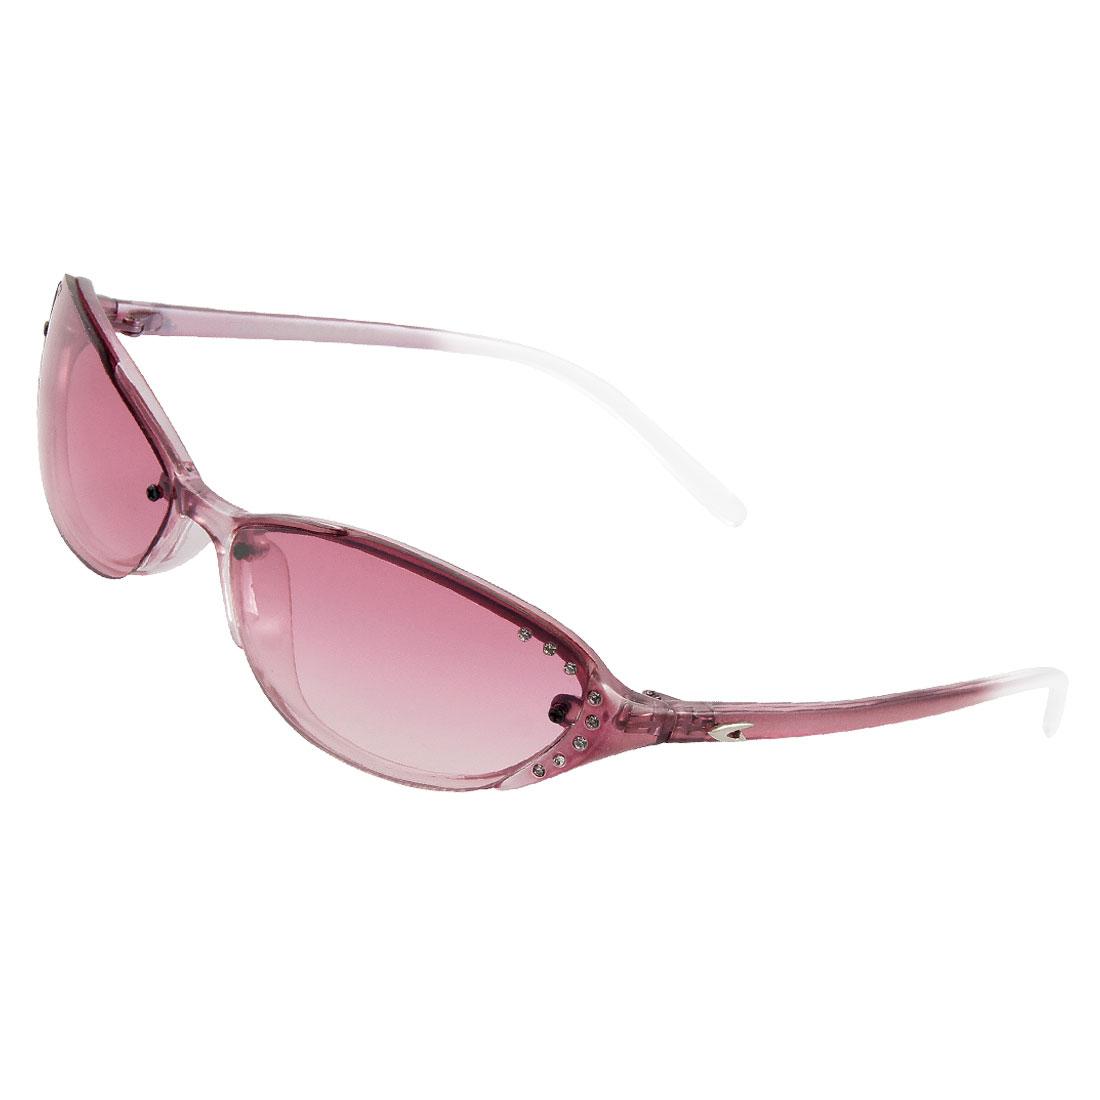 Ladies Amaranth Clear Plastic Full Frame Sunglasses Eyeglasses